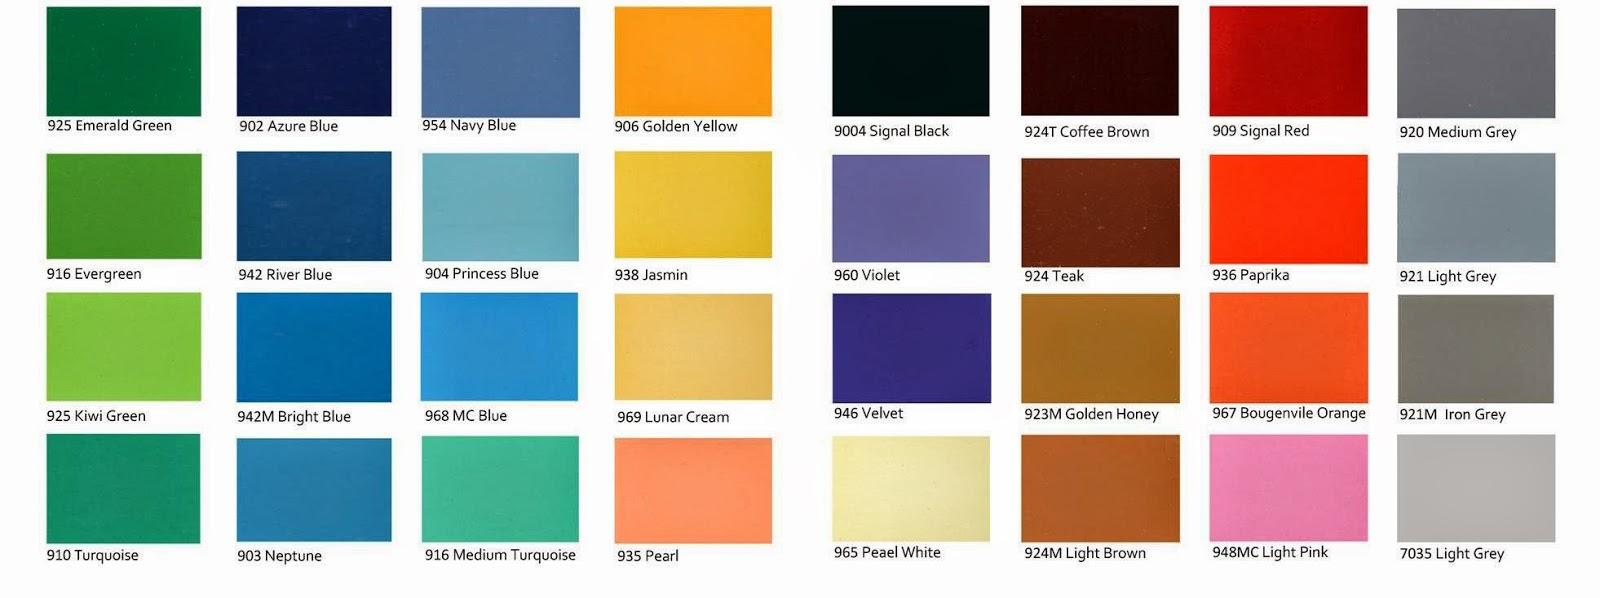 warna-cat-rumah-minimalis-modern-terbaru-gambar